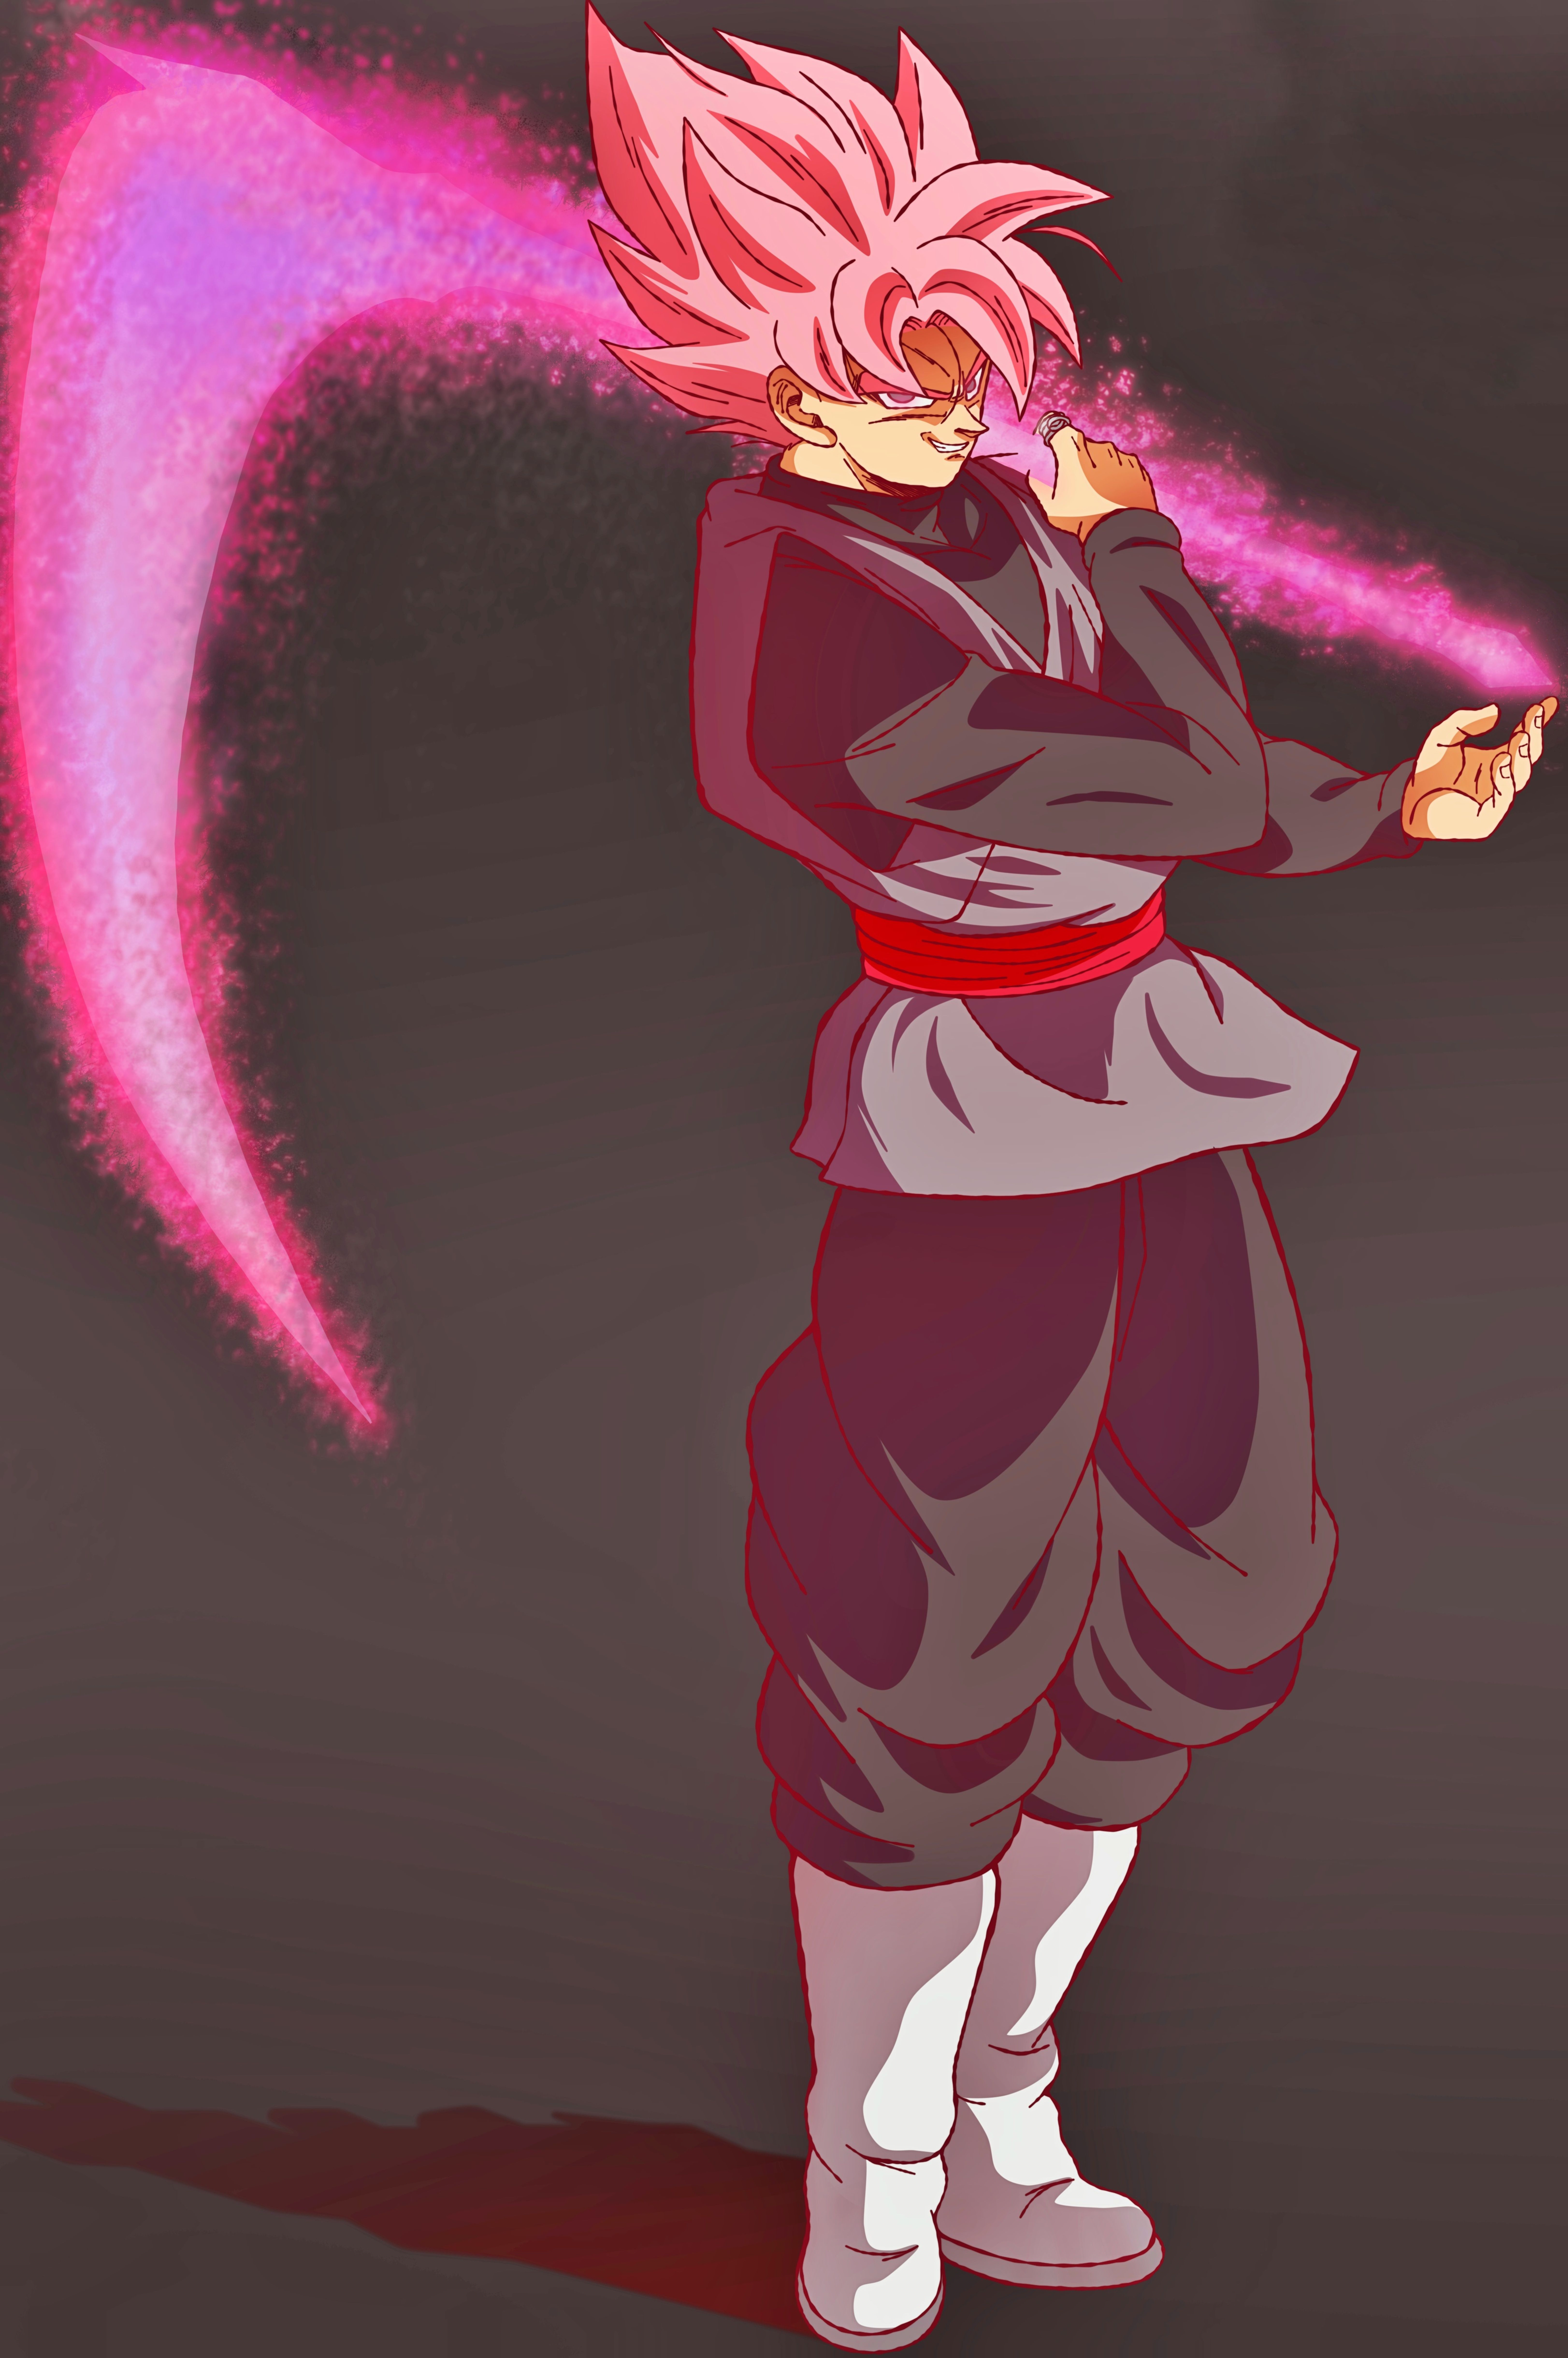 Black Goku Ssj Rose Anime Dragon Ball Super Dragon Ball Art Dragon Ball Wallpapers